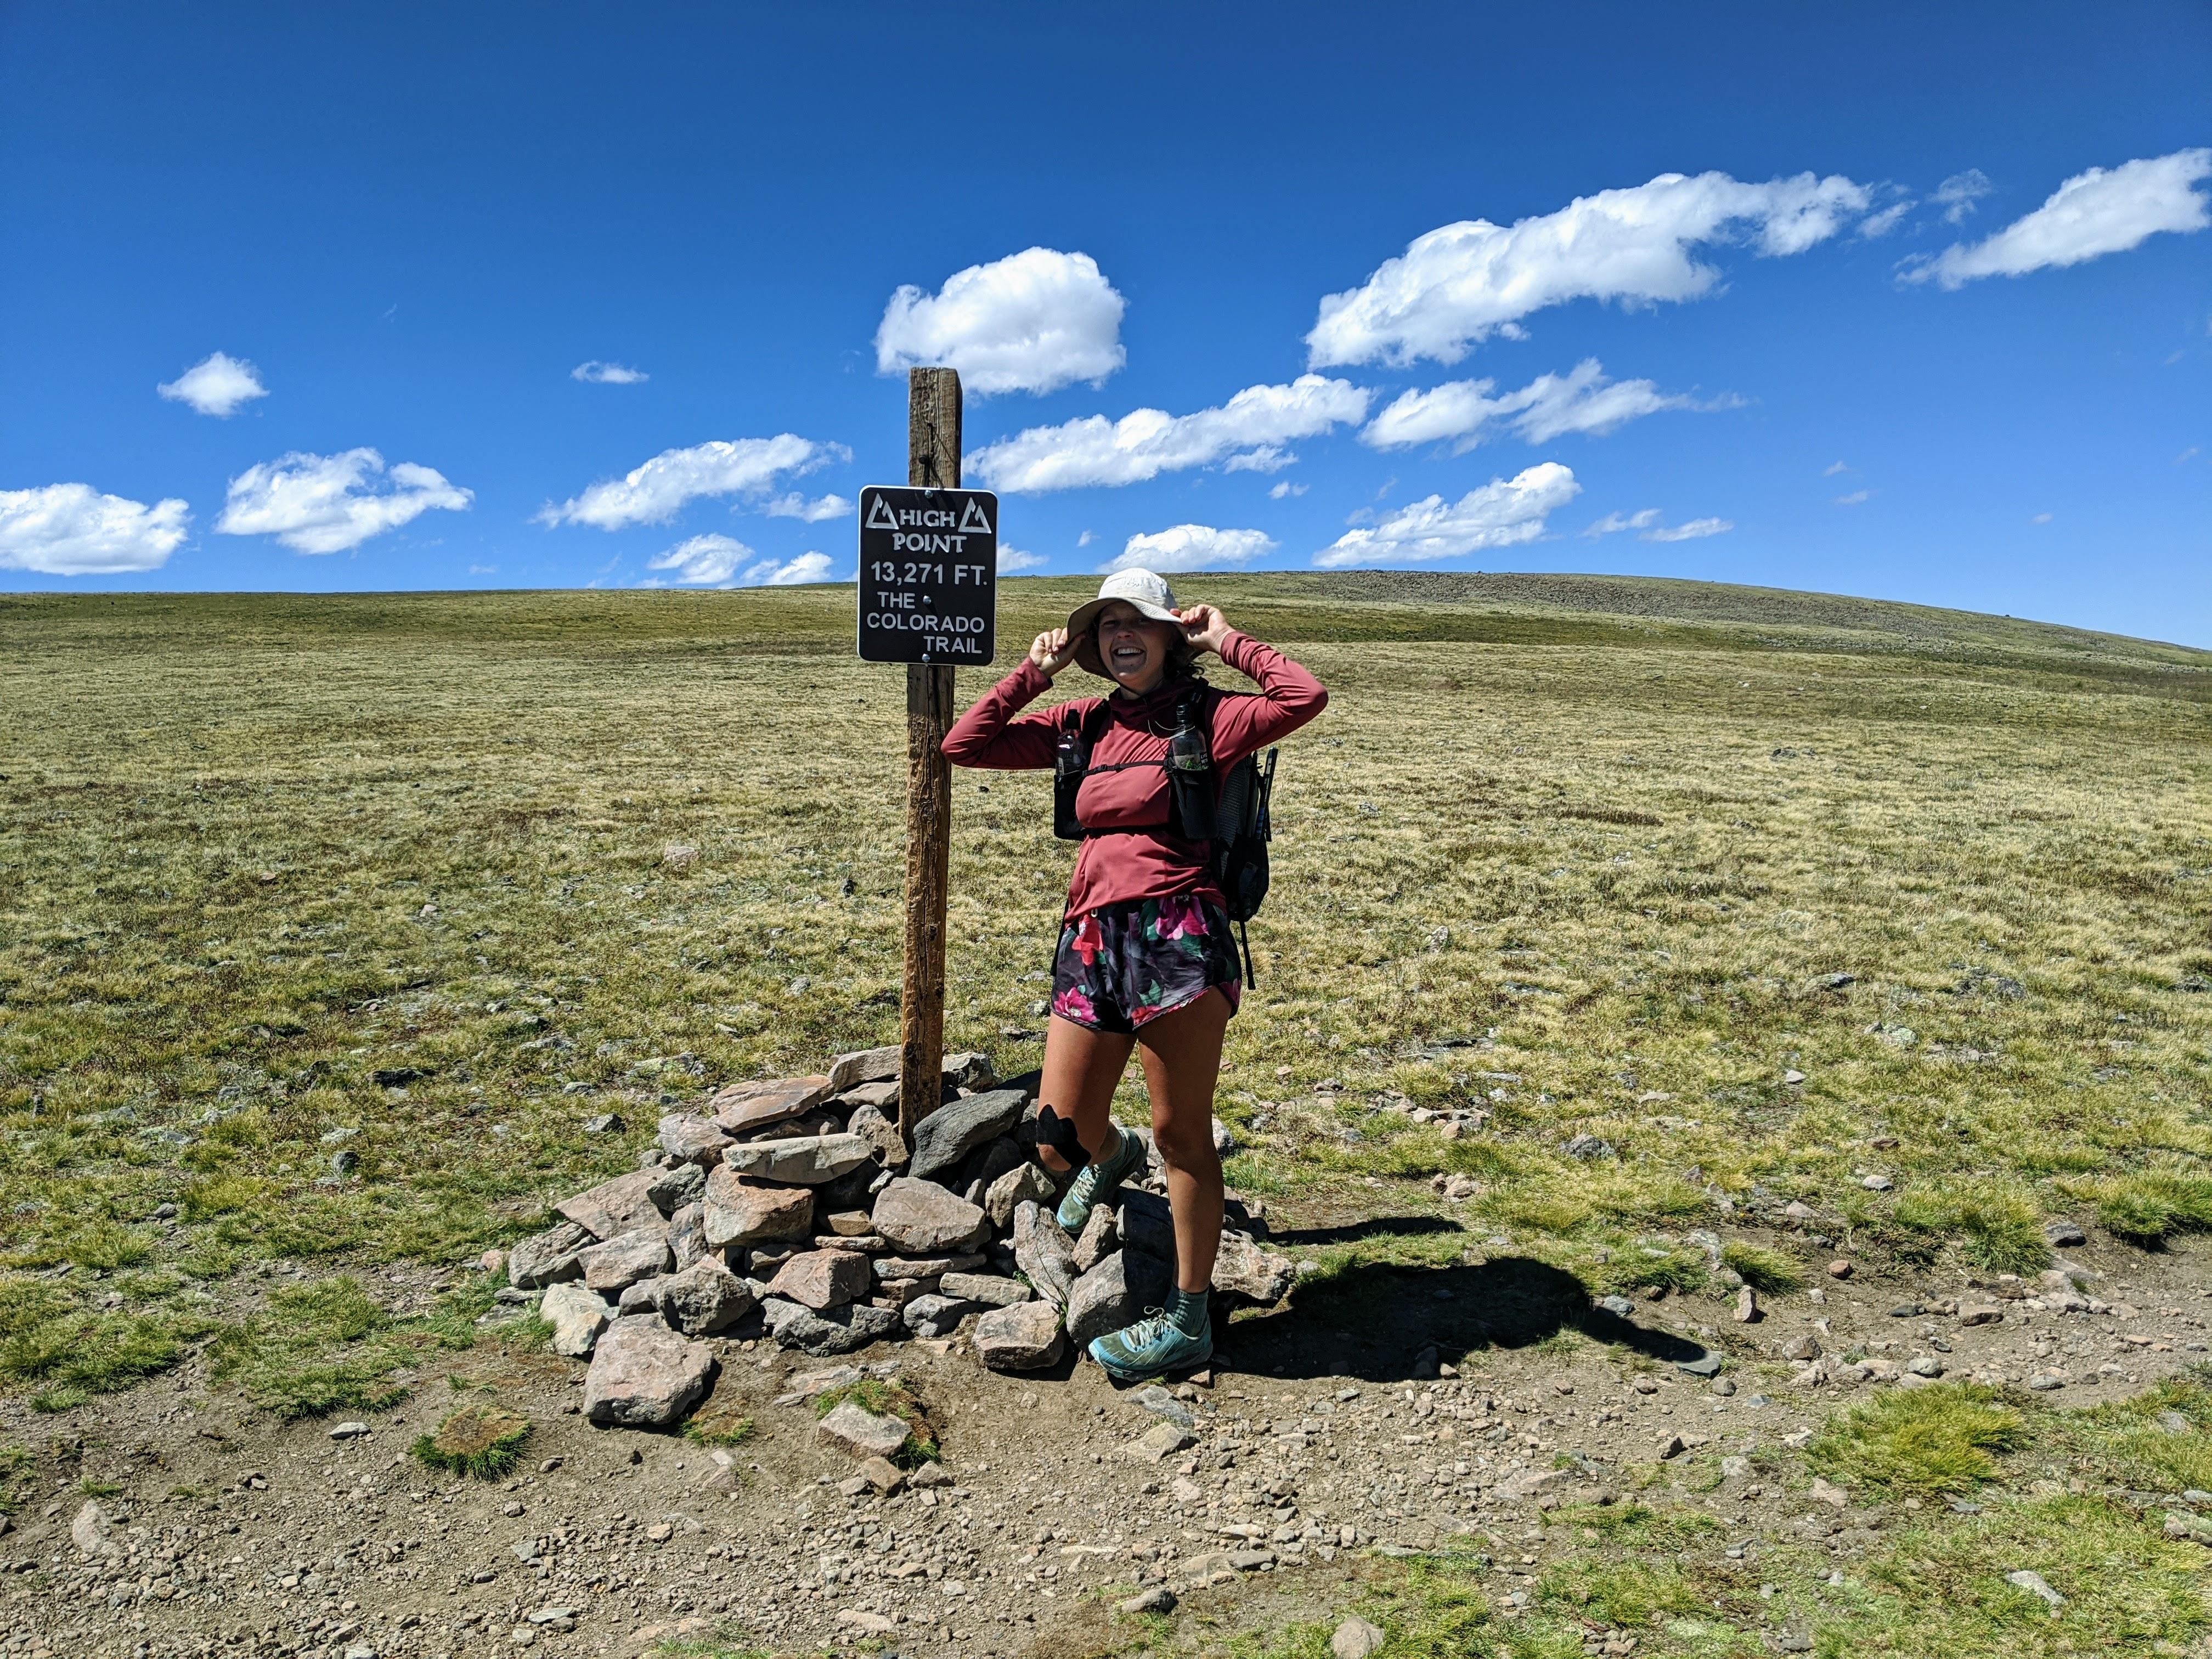 colorado trail high point mikaela osler fkt